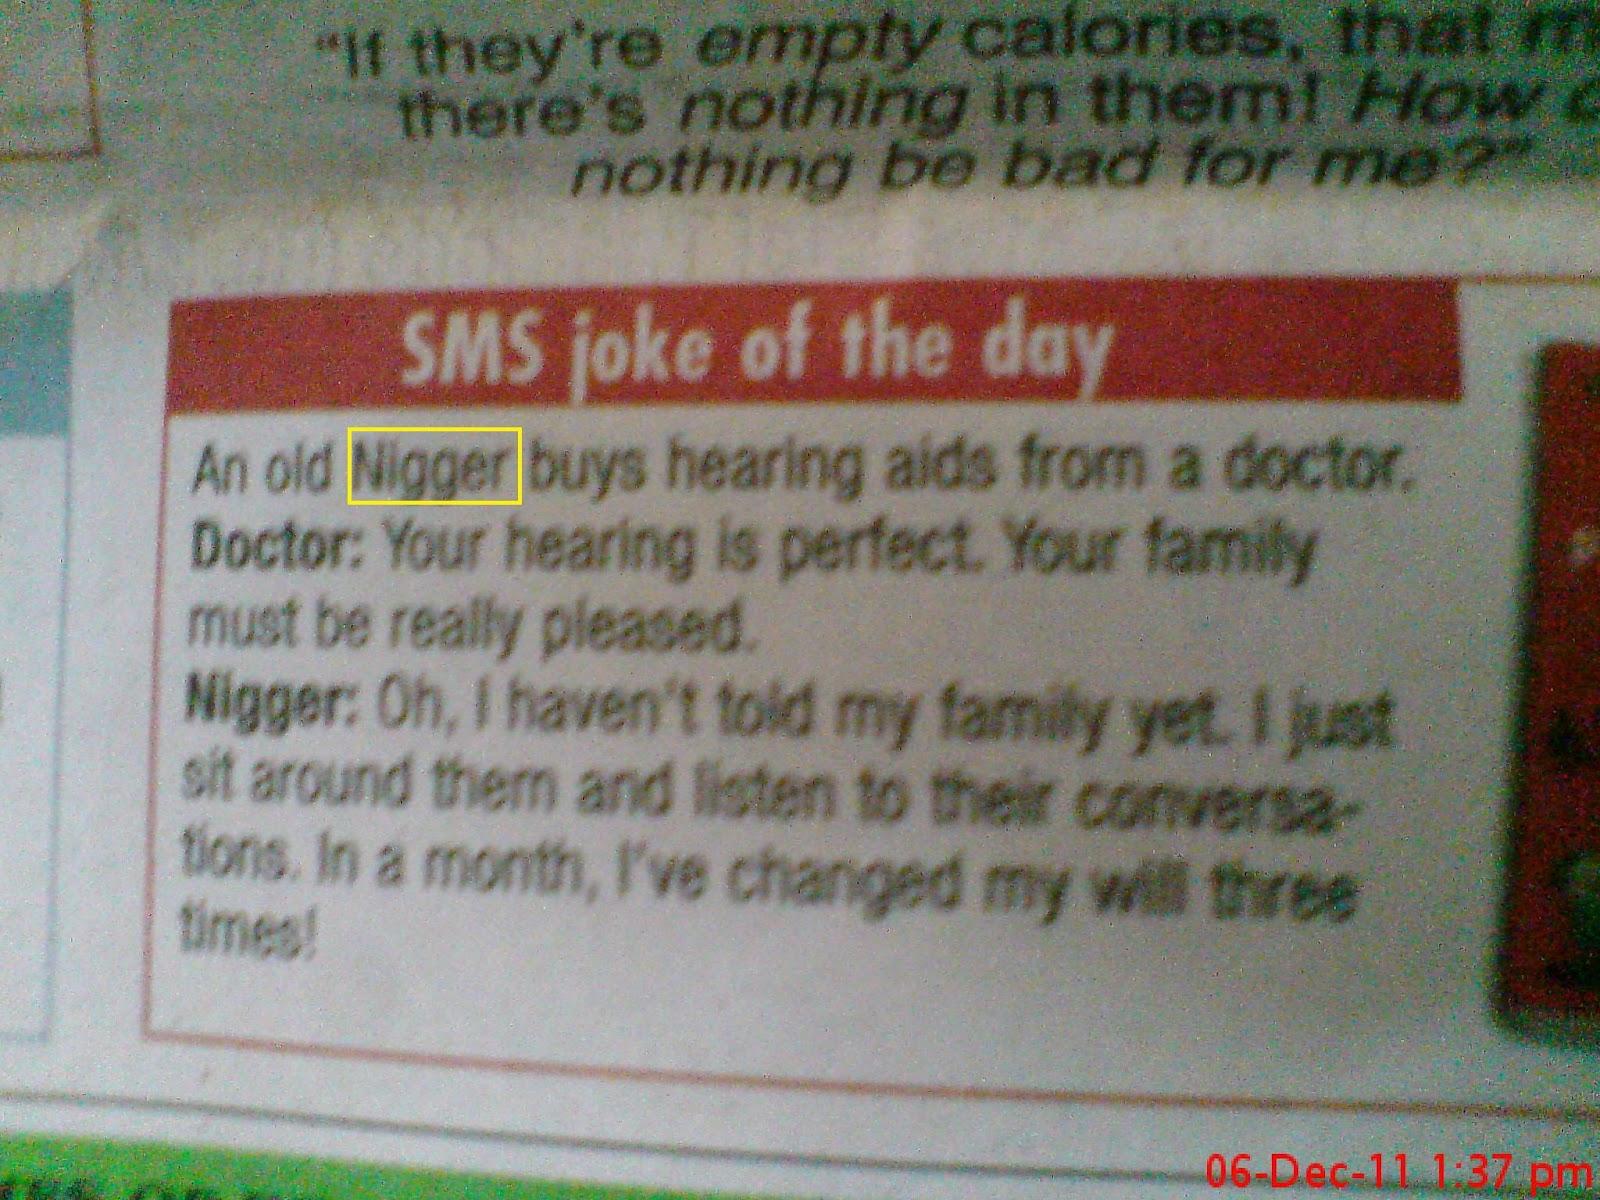 Bombay Times Nigger joke